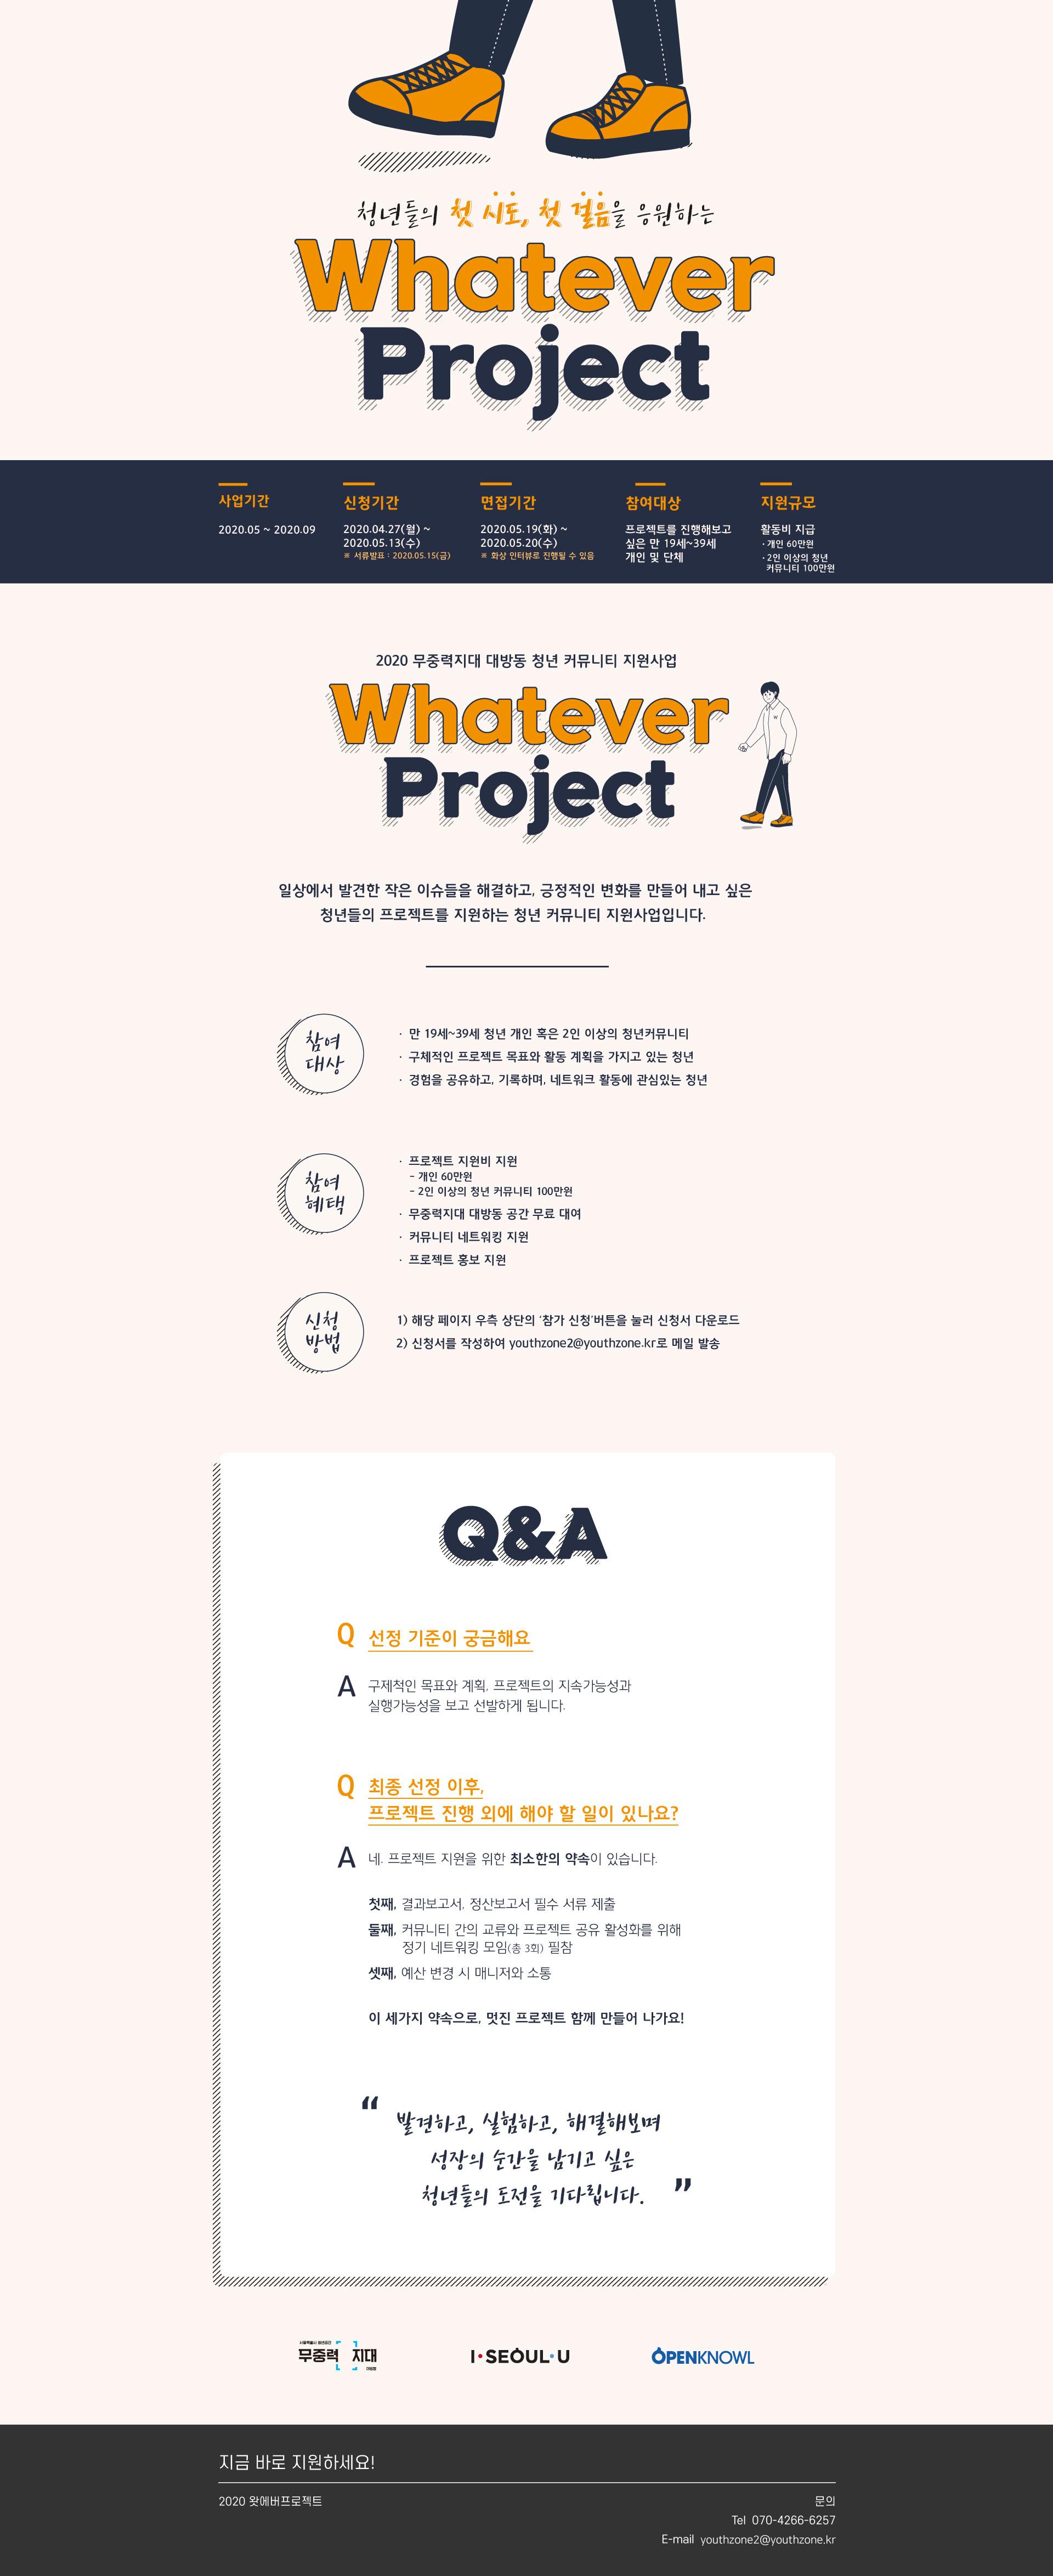 2020<Whatever Project 왓에버프로젝트>참여자 모집